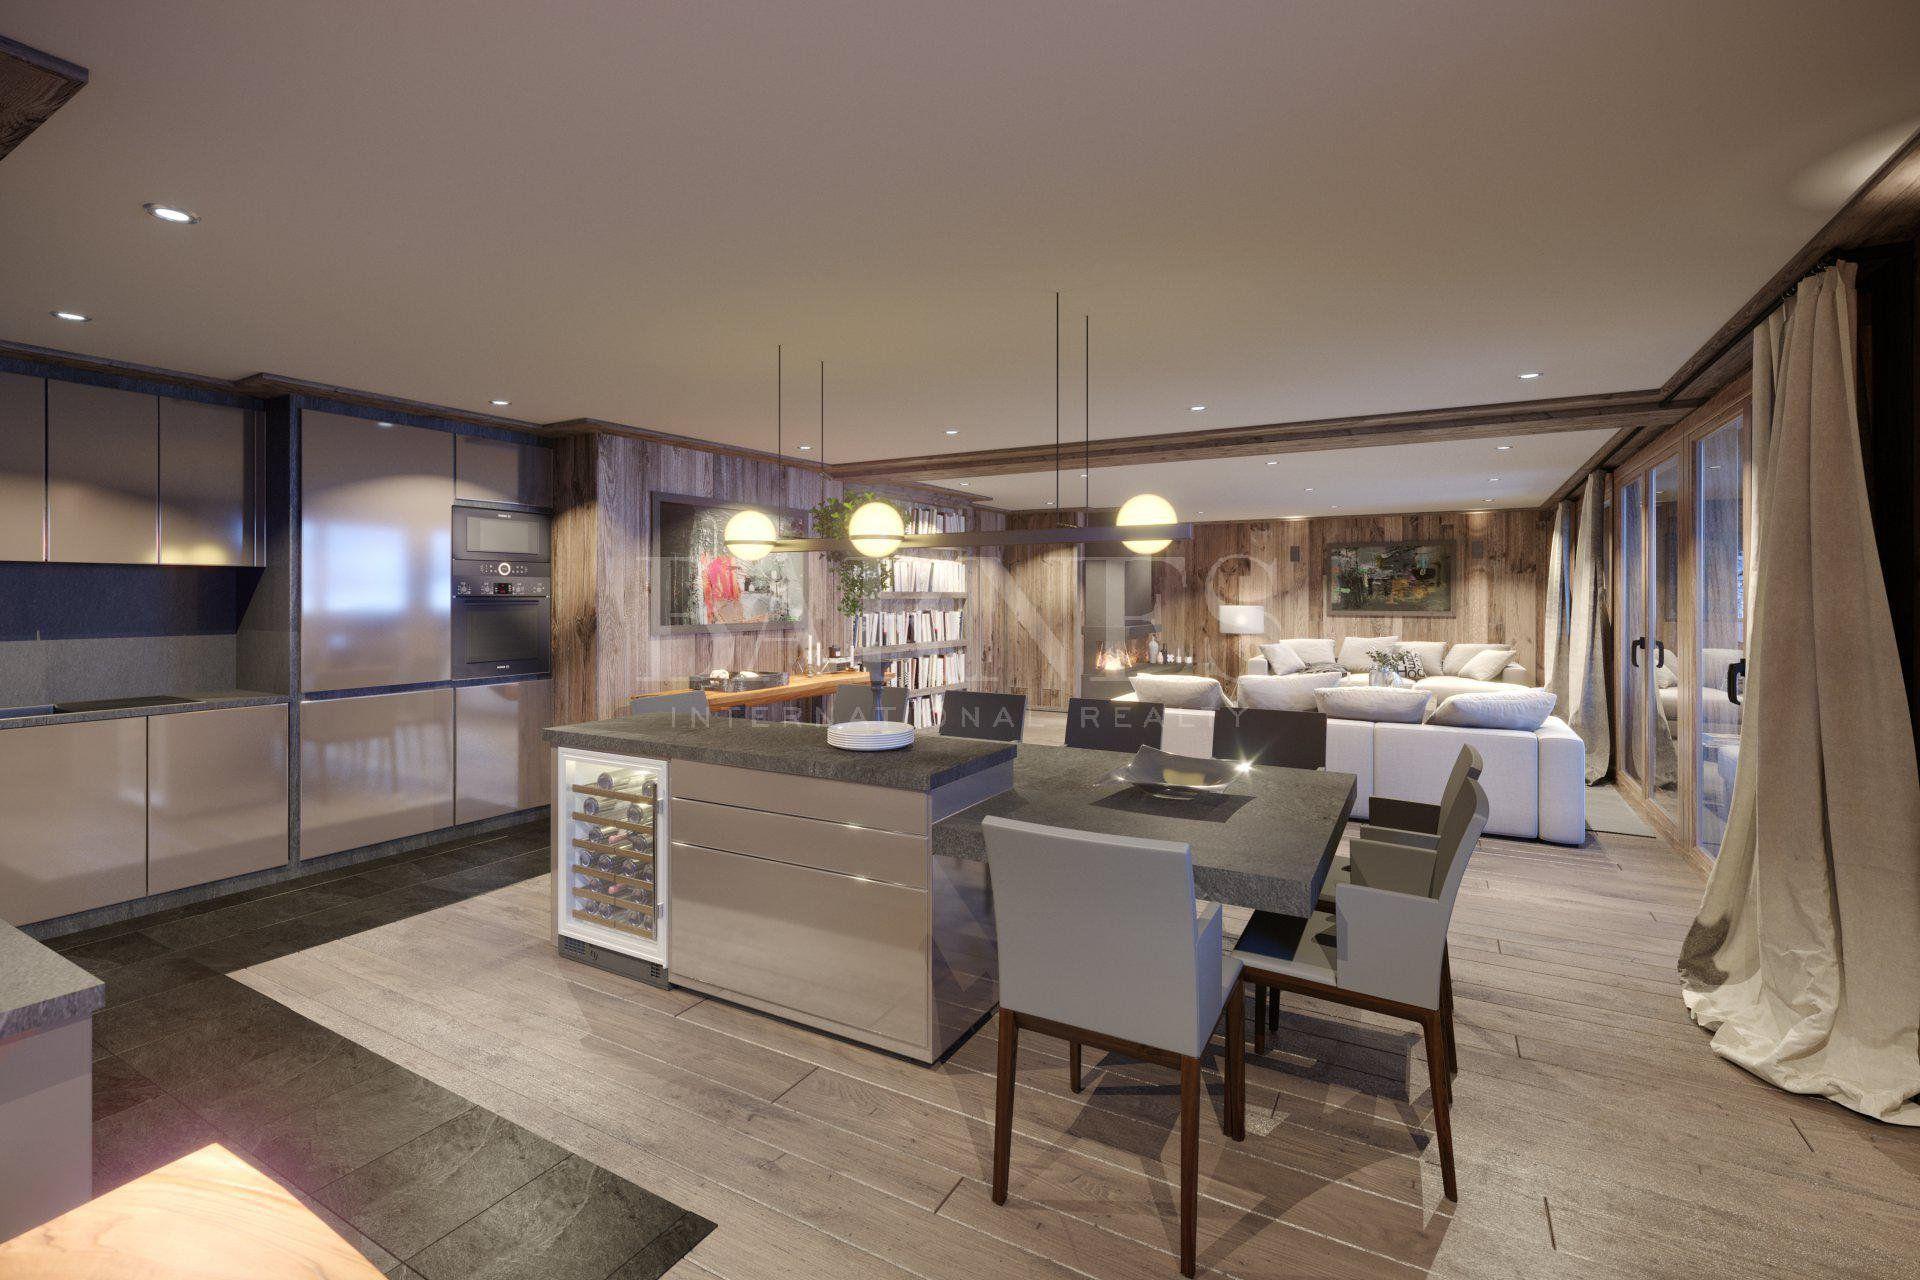 Stunning 4 bedrooms, ski in ski out